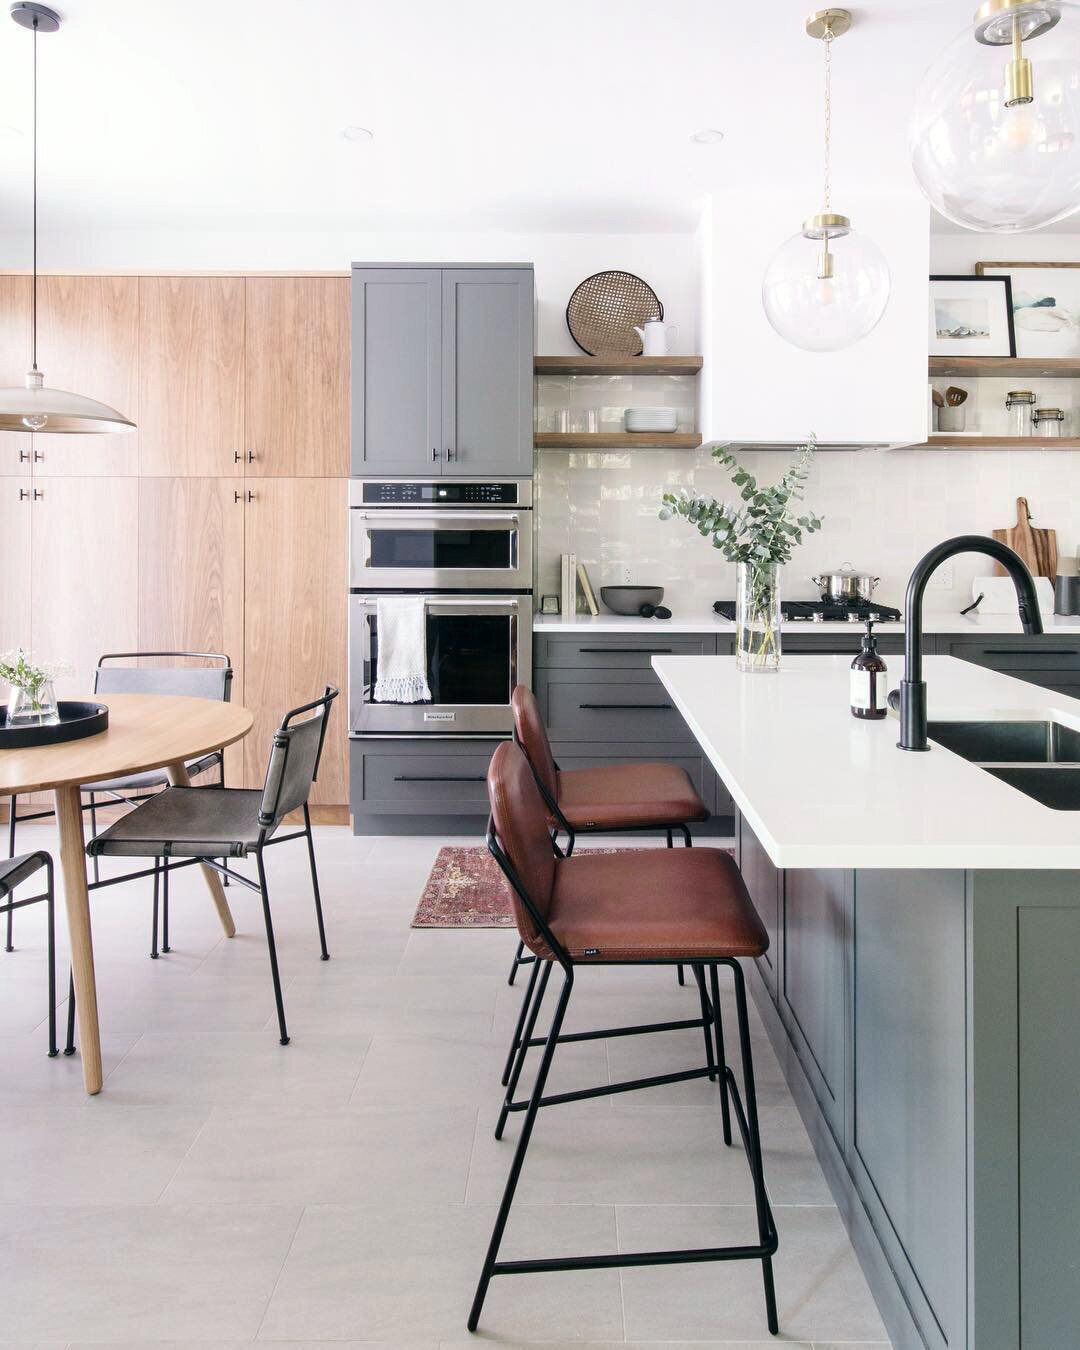 orleans_kitchen_remodel1_edit.jpg